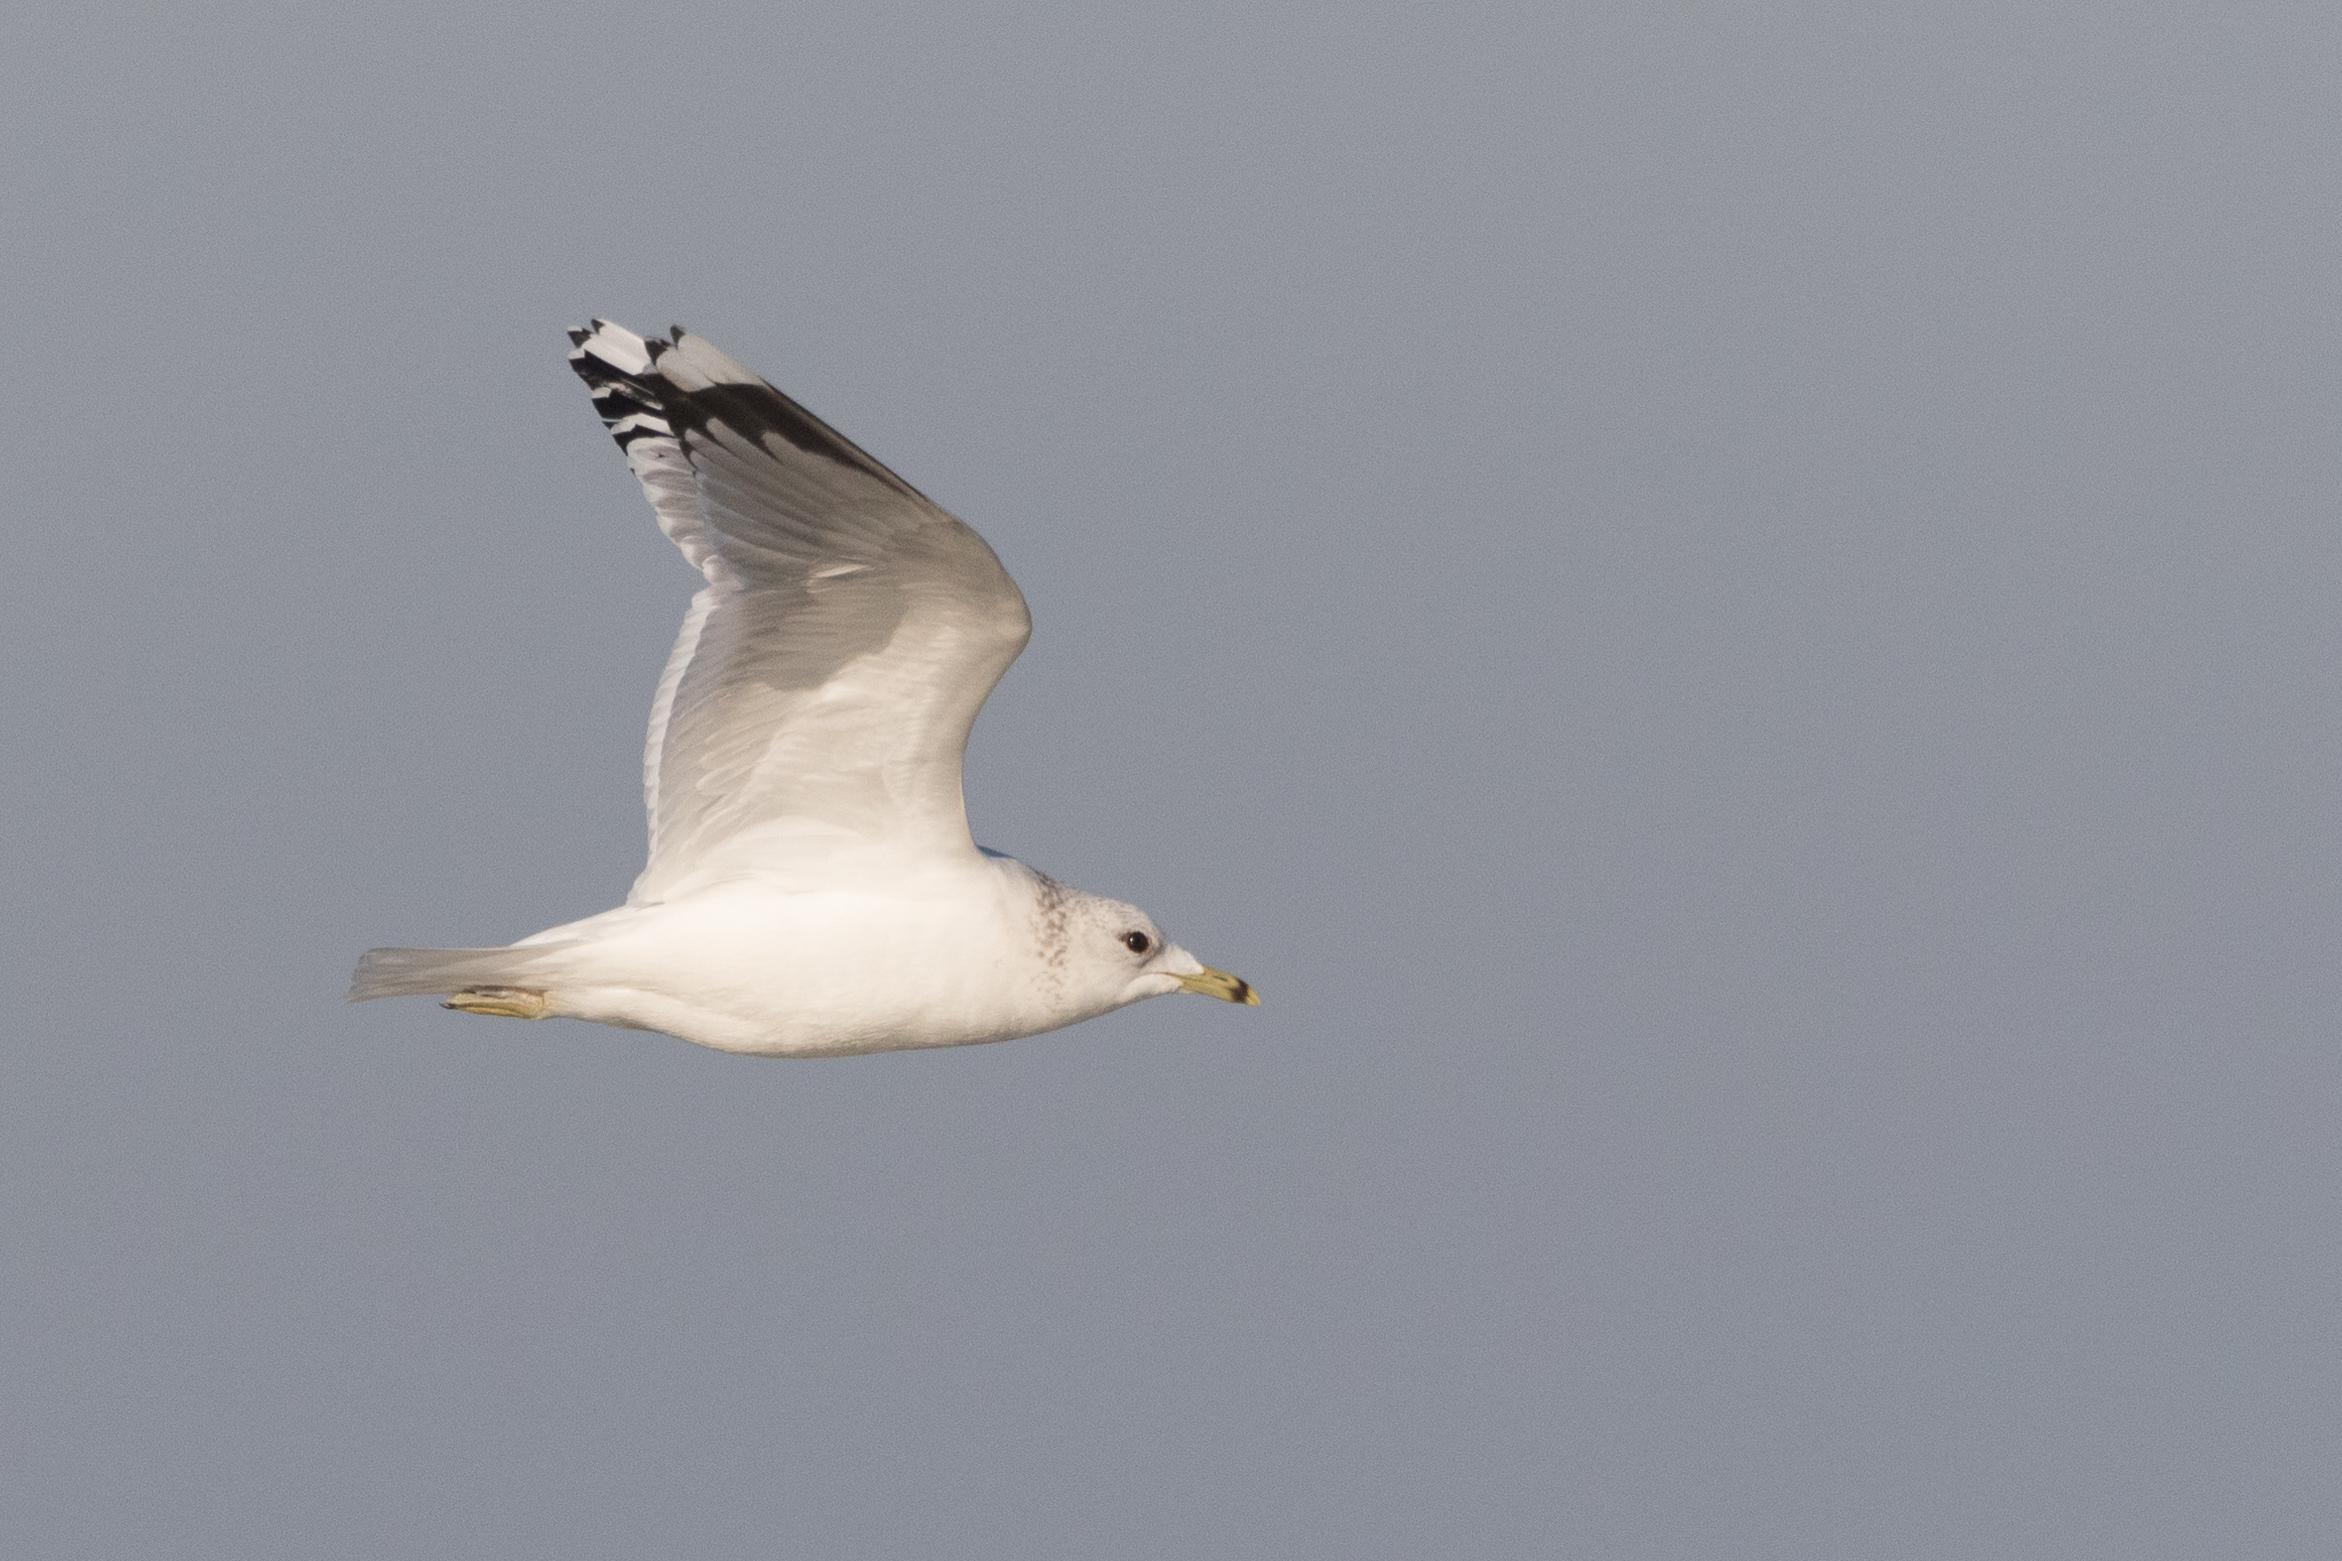 20170121-Common Gull Adult-78.jpg